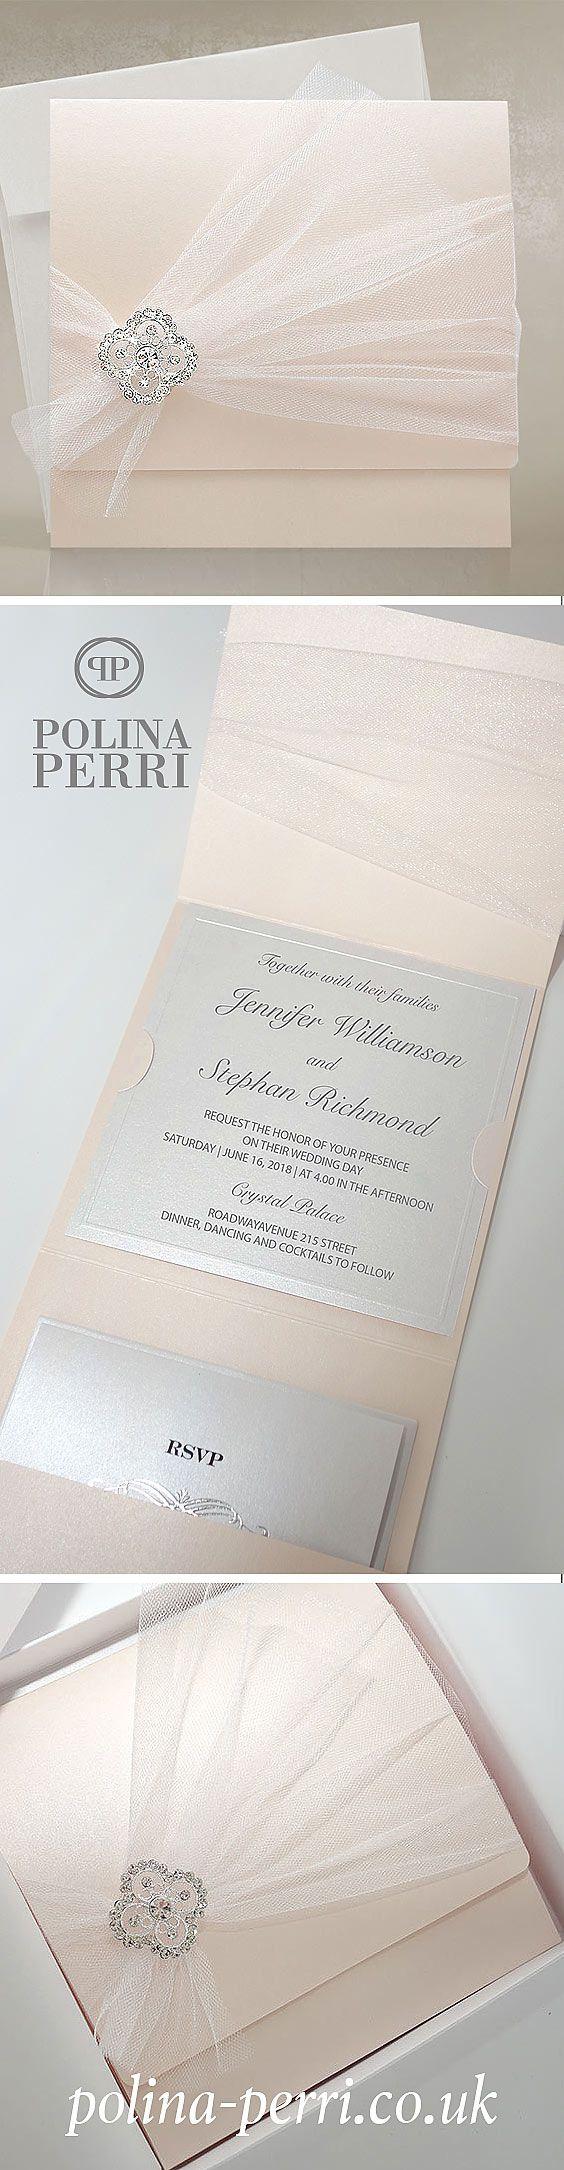 Beautiful blush pink invitations from Polina Perri - luxury ...